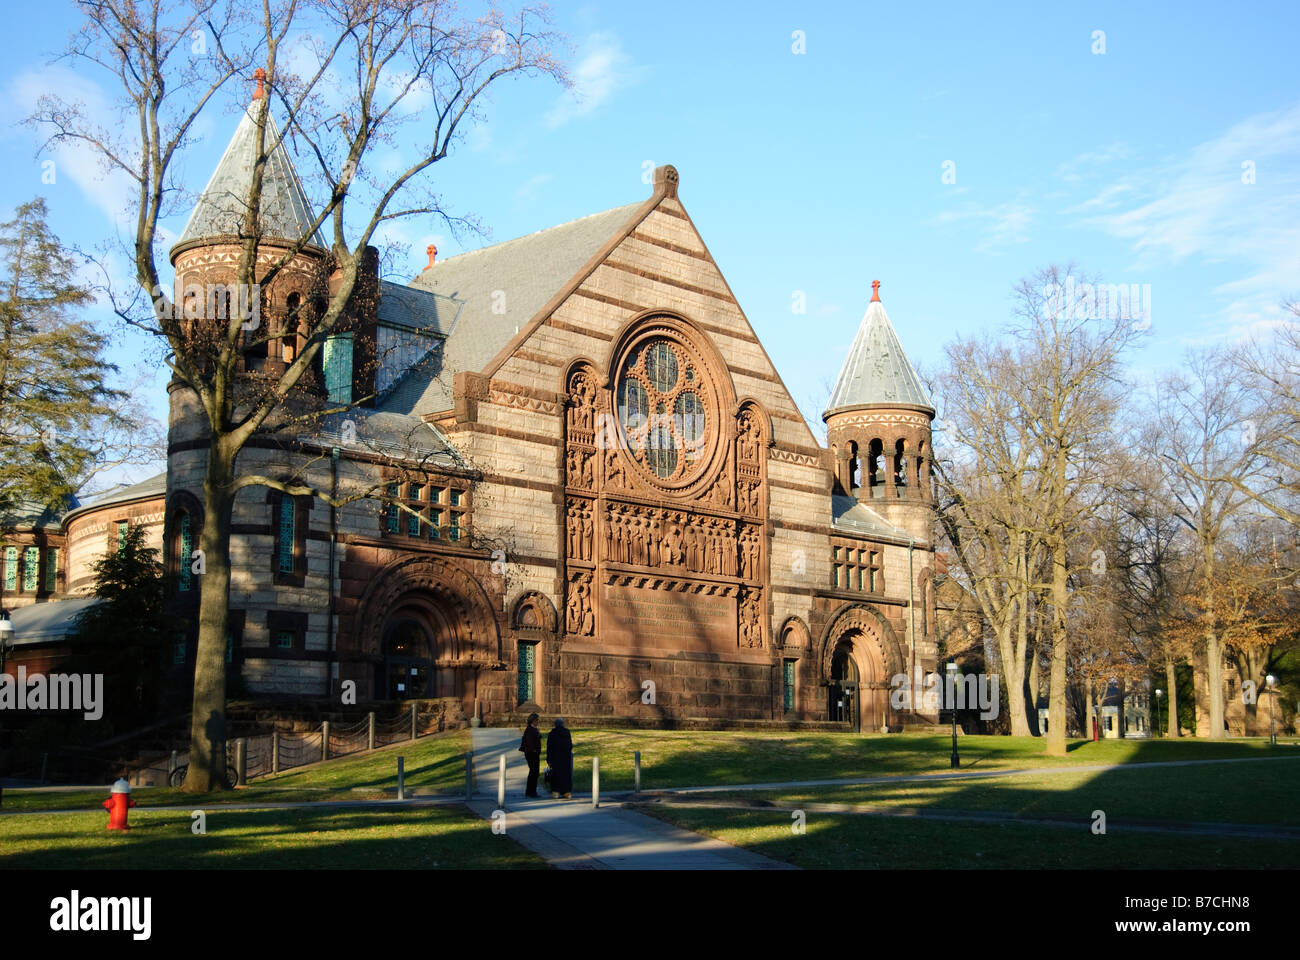 Look - Campus: on Looks Amber Princeton University video